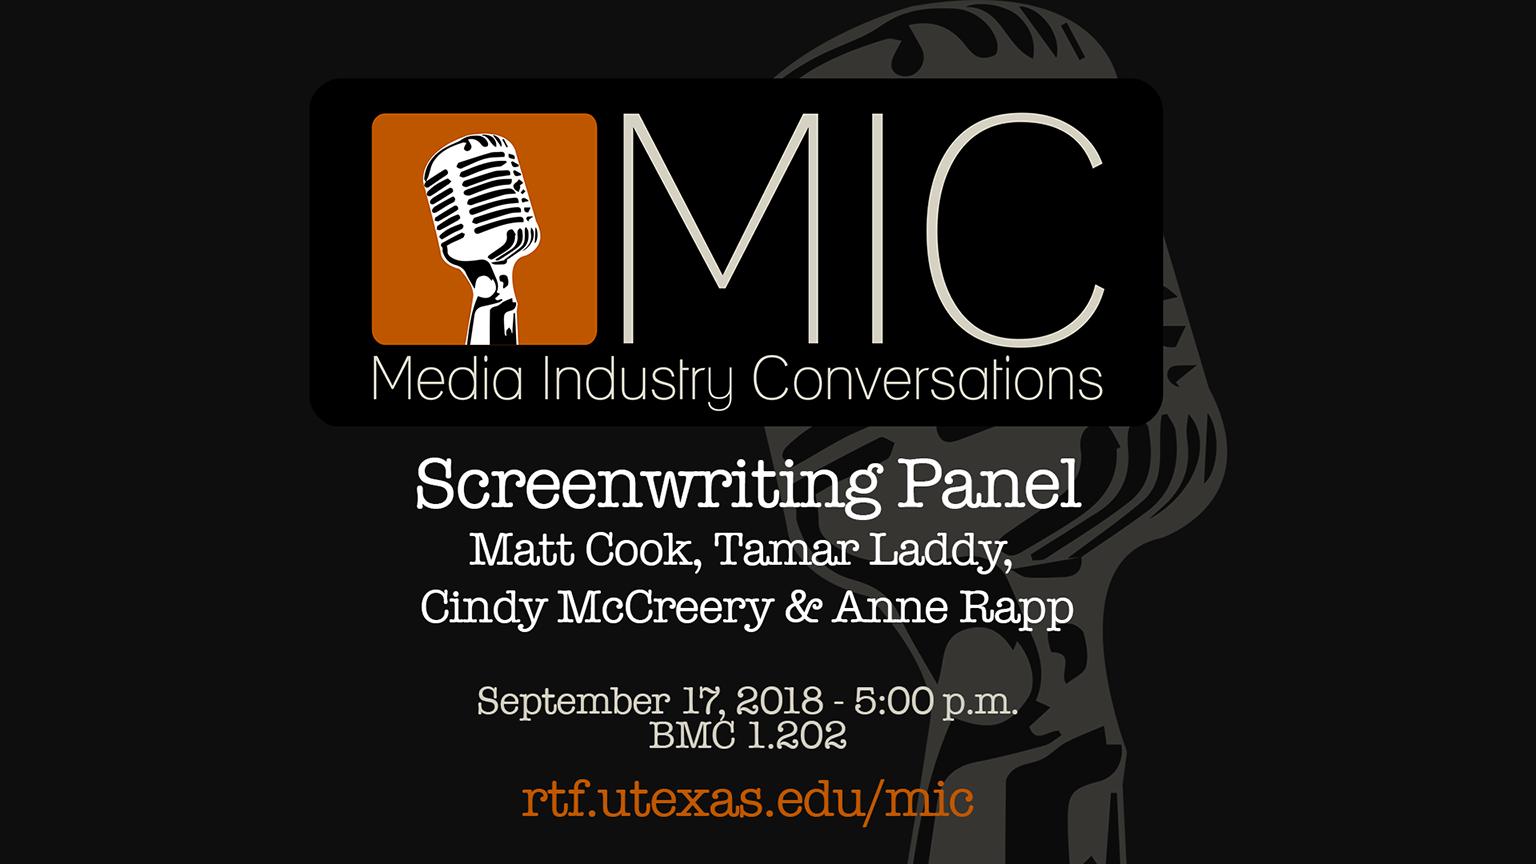 screenwriting_panel_MIC_september_17_2018_matt_cook_cindy_mccreery_tamar_laddy_anne_rapp_5pm_BMC_1.202